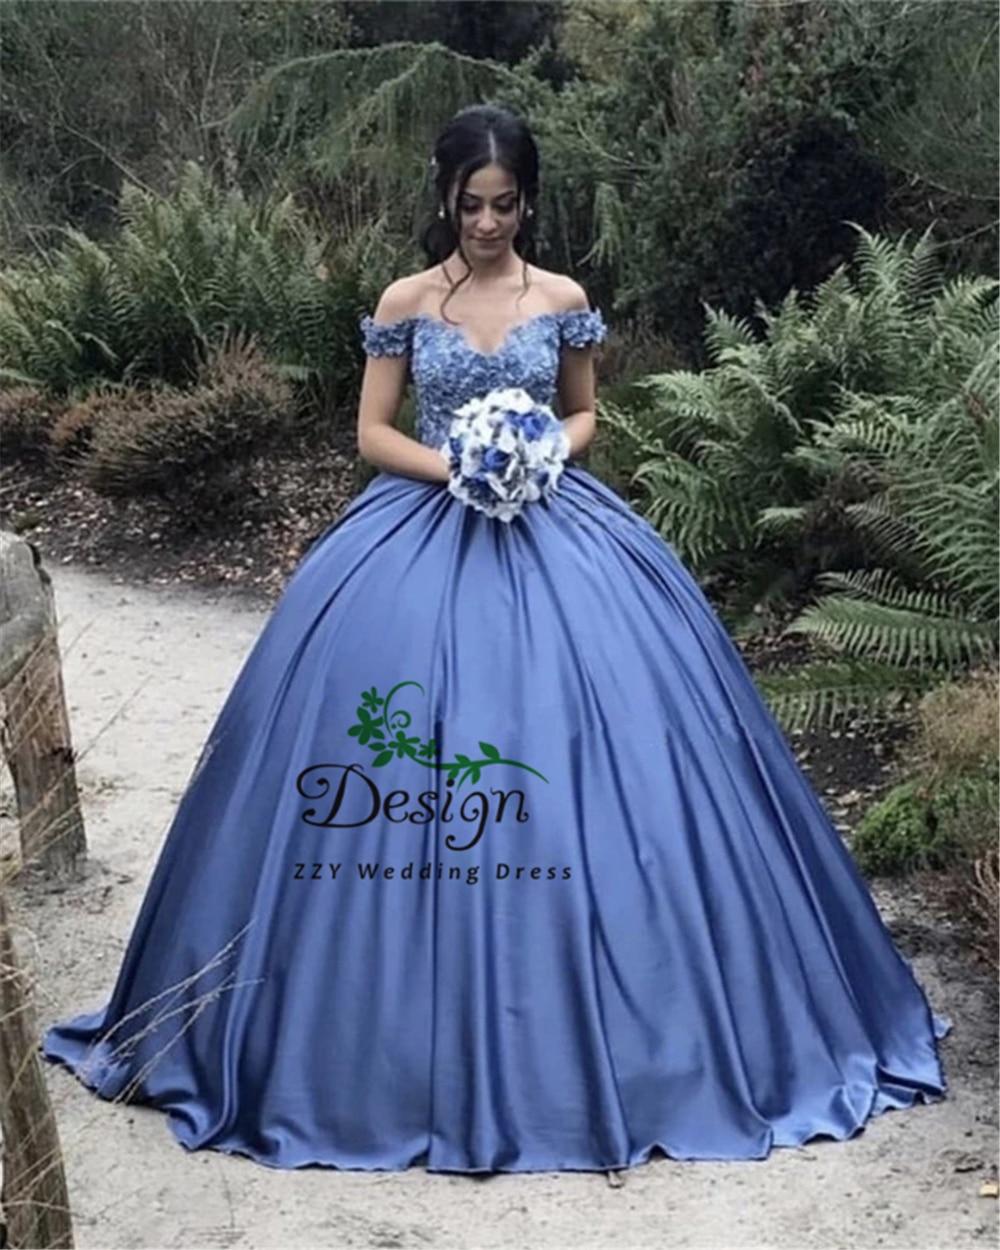 Blue Satin Flowers Appliques Quinceanera Dresses Ball Gown Vestido De 15 Anos 2019 Vestidos De Quinceaneras With Handworks